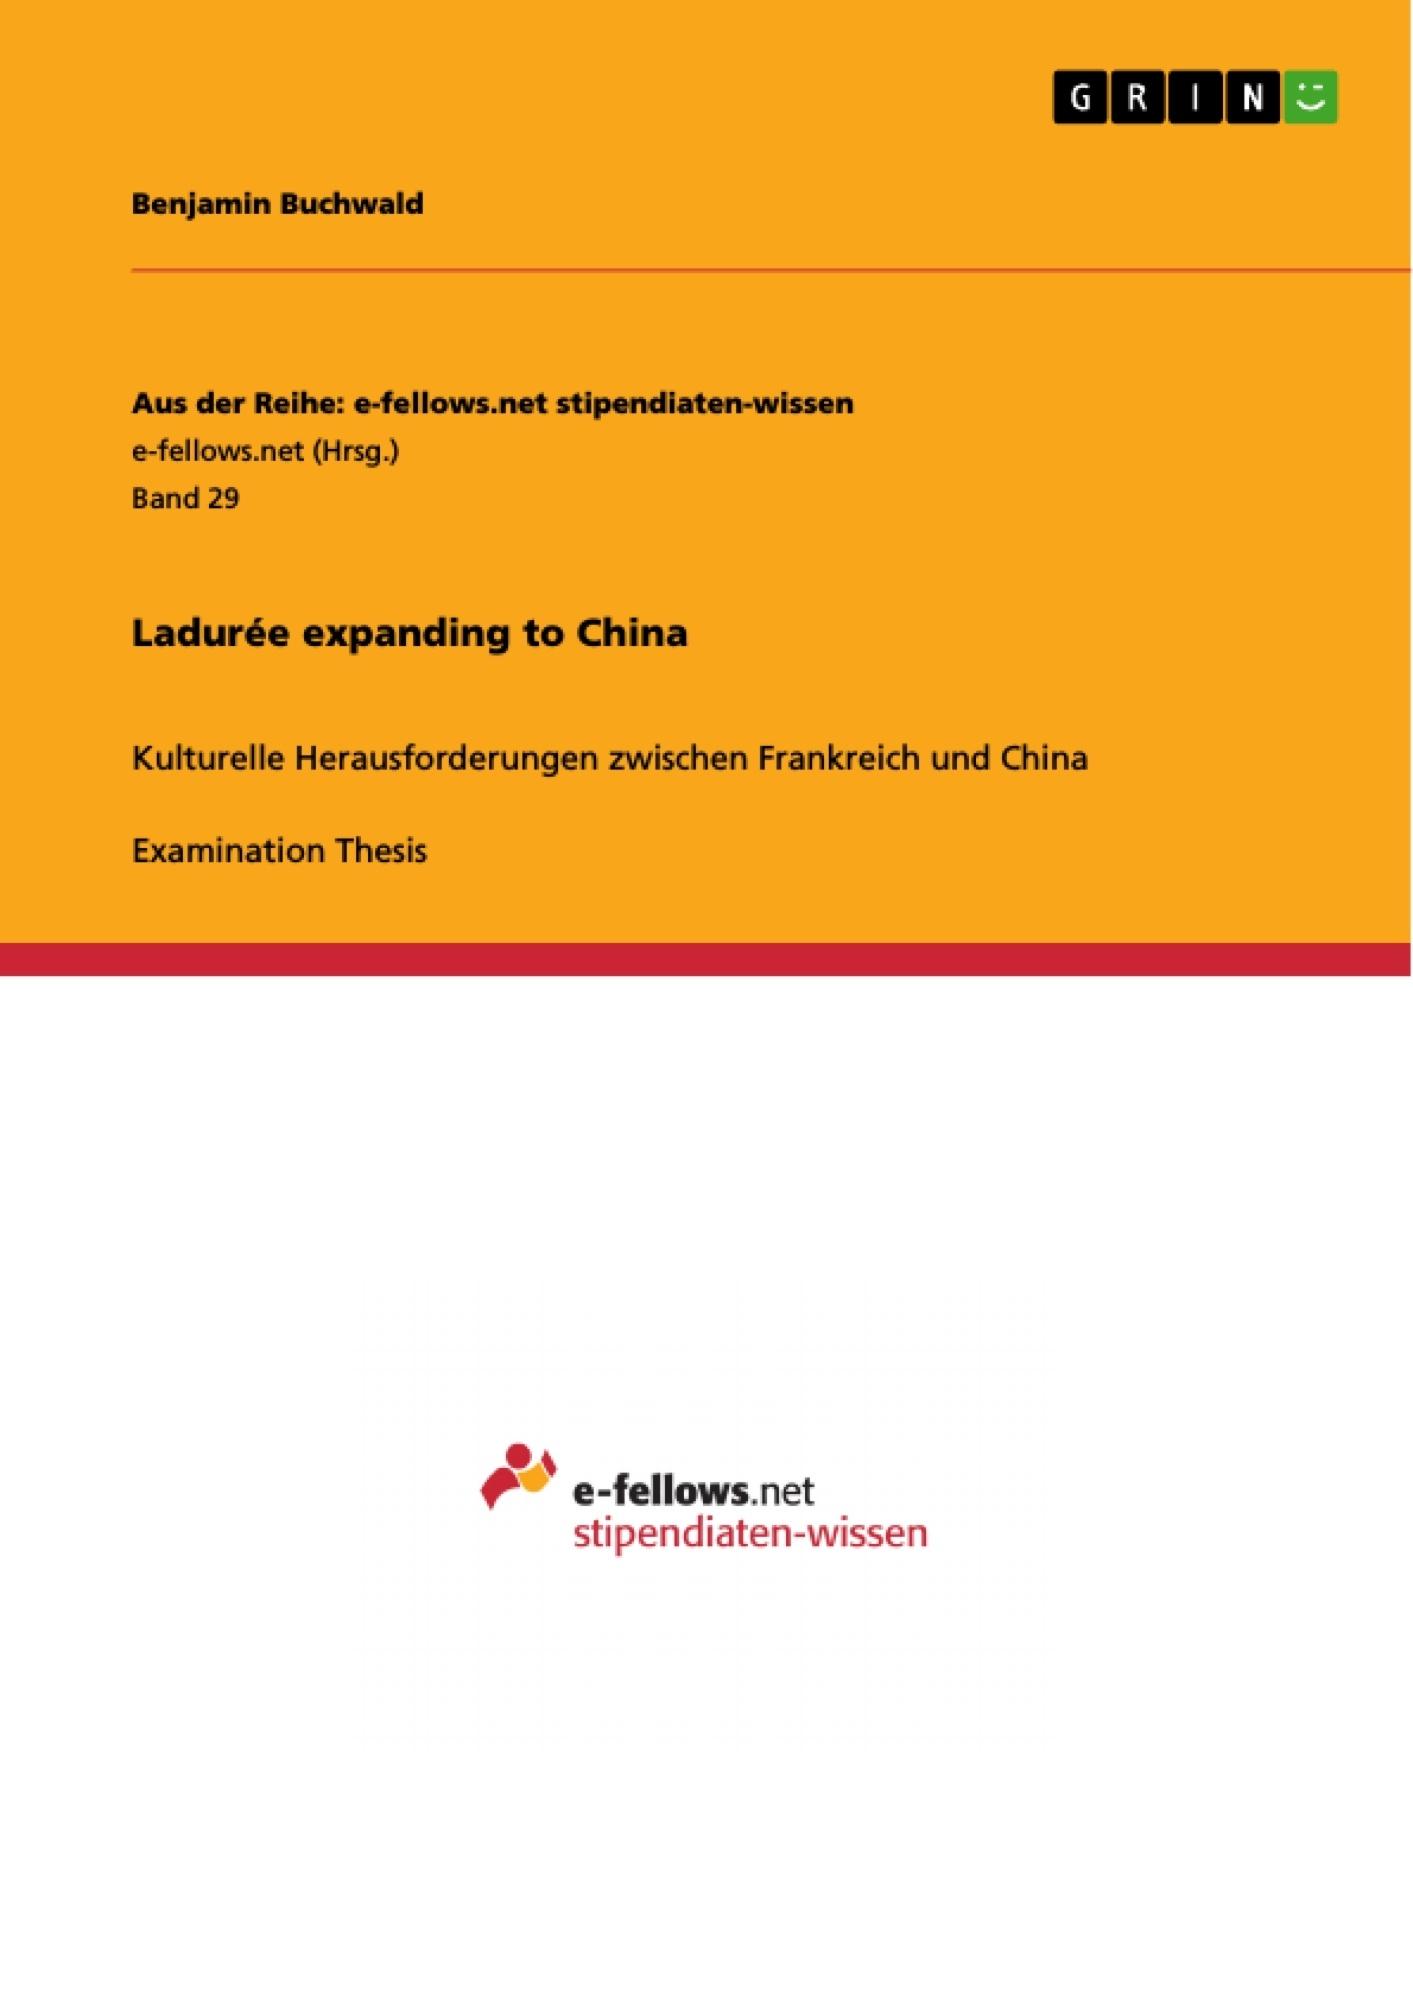 Title: Ladurée expanding to China